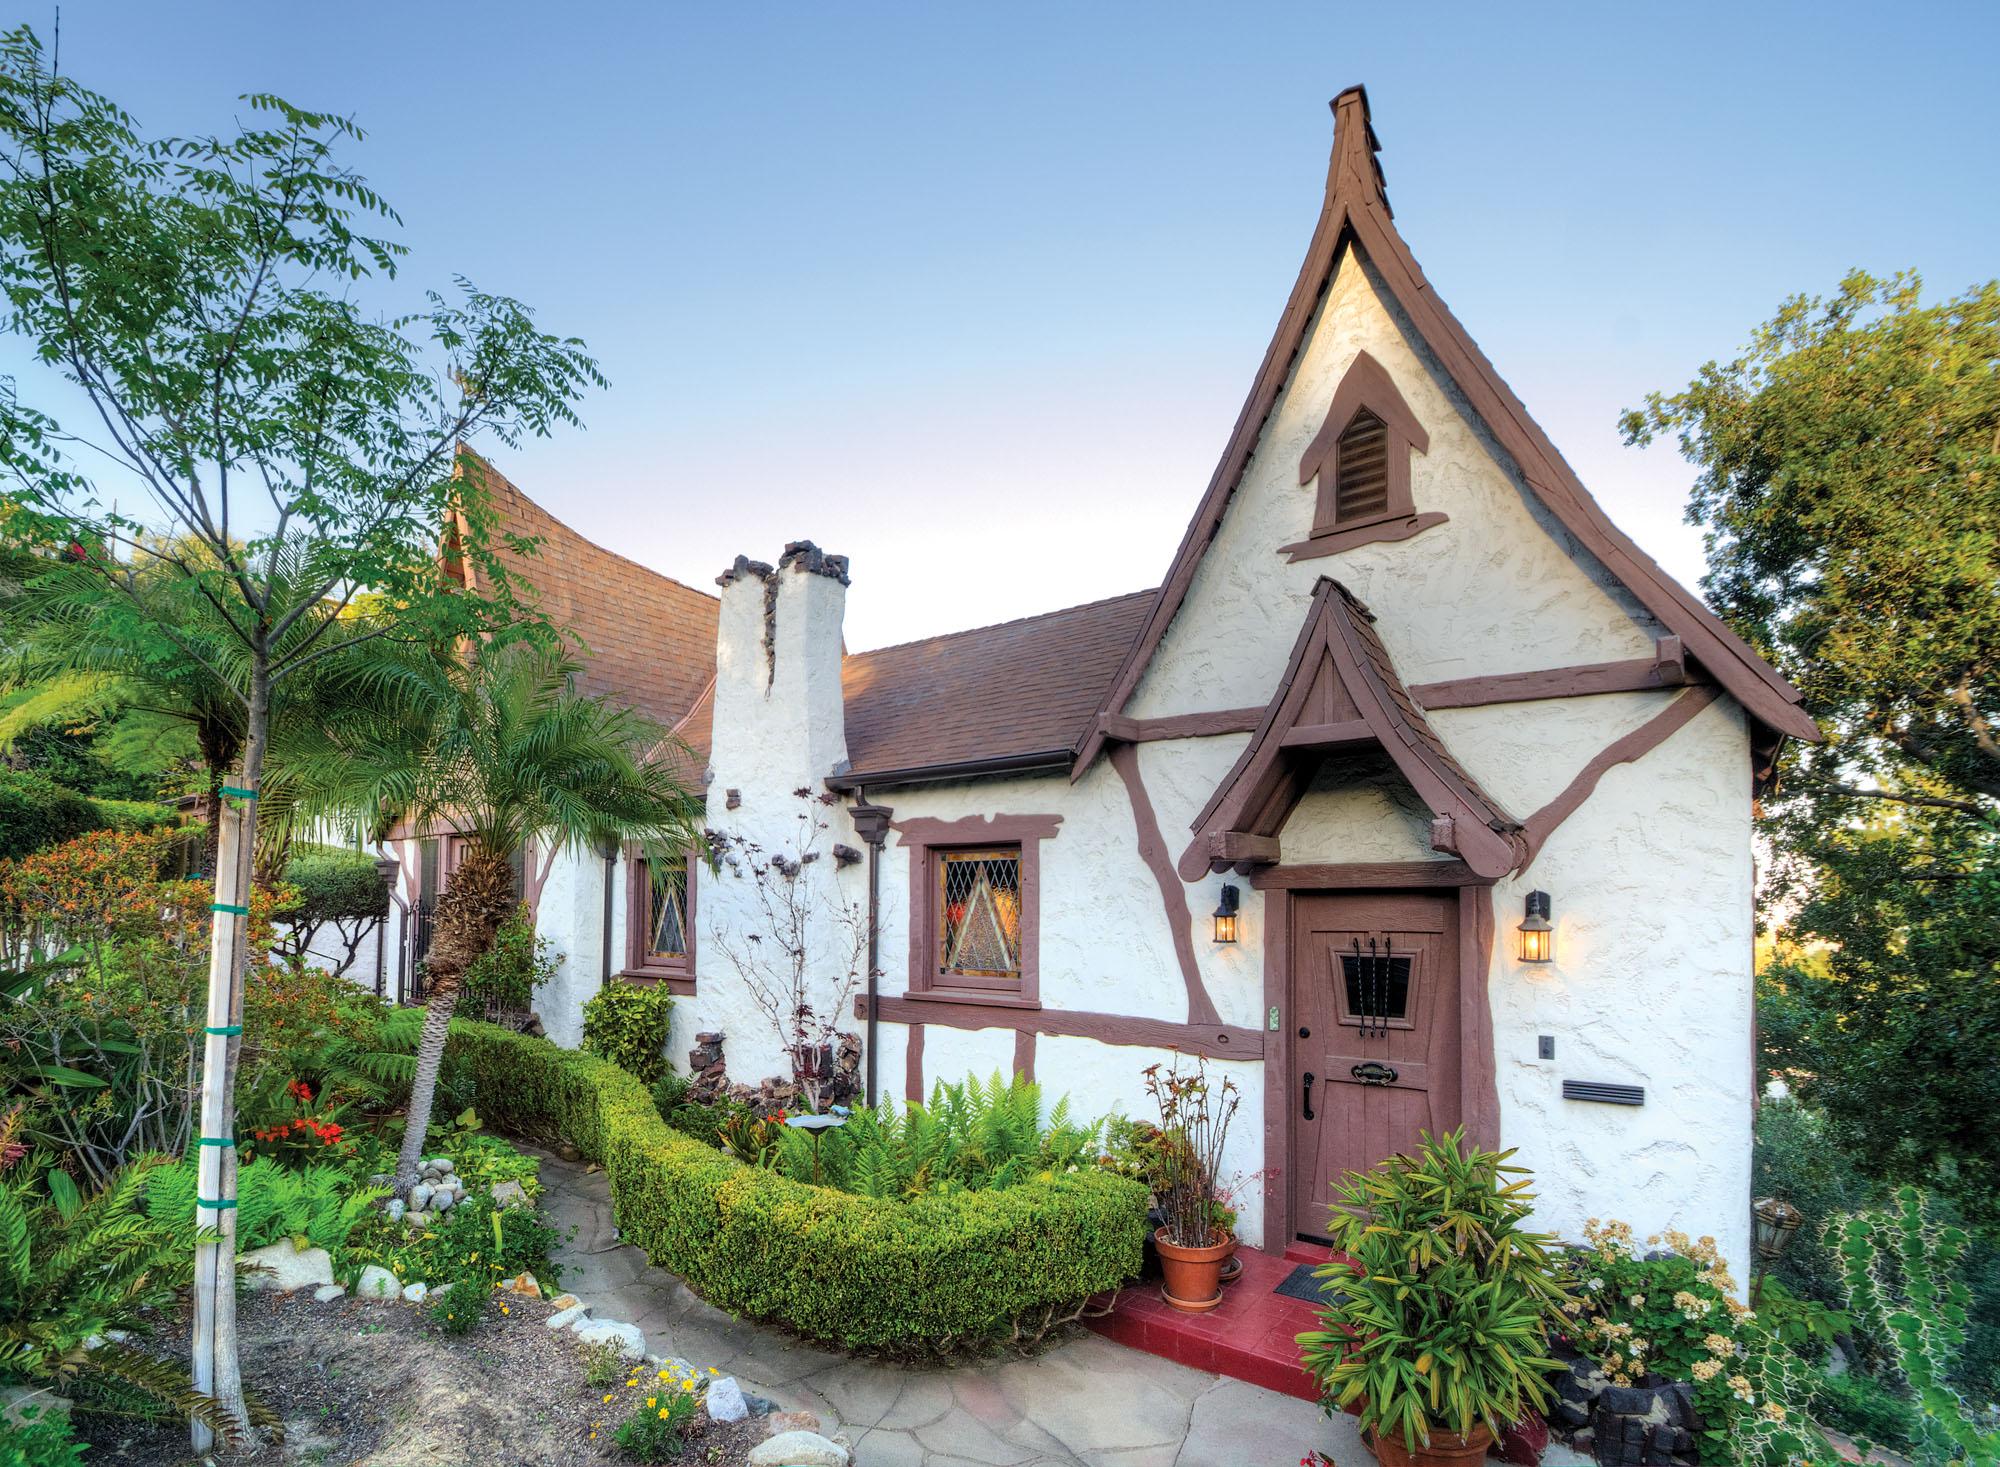 the Hlaffer–Courcier house